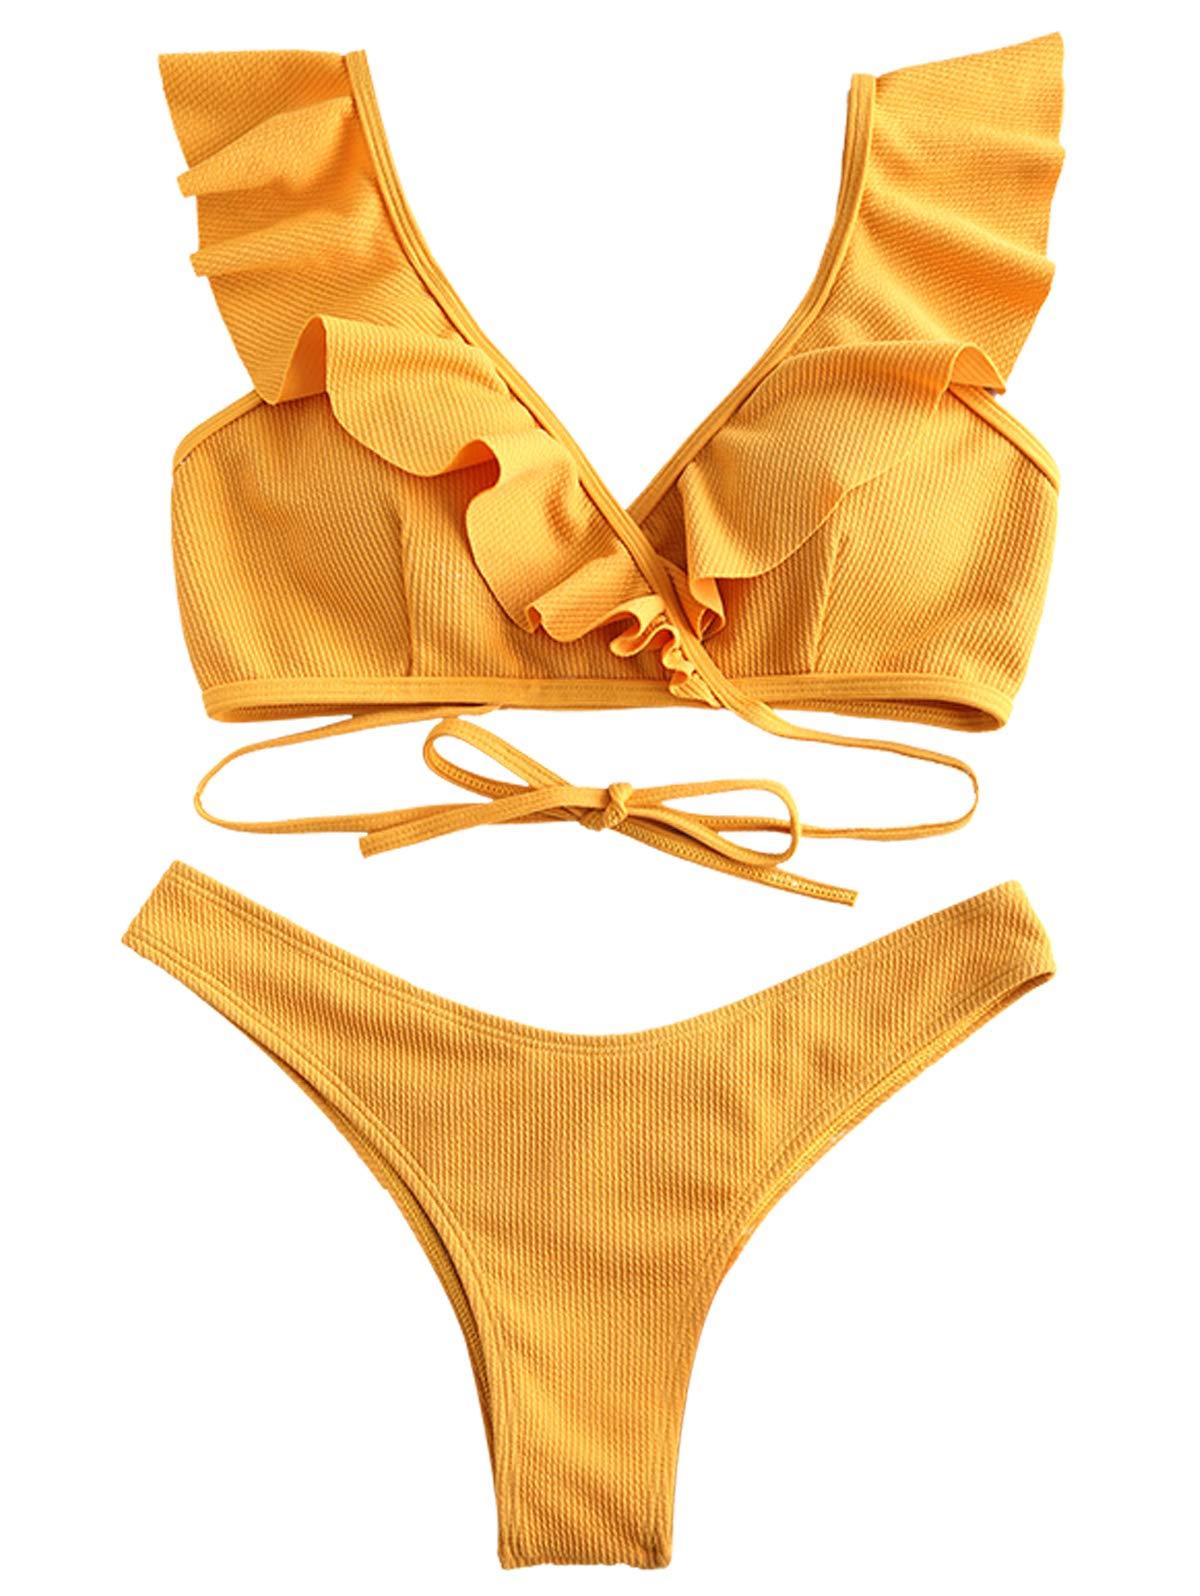 ZAFUL Womens Tie Knot Front Swimsuit High Waisted Bikini Sets Two Piece Swimwear Beachwear